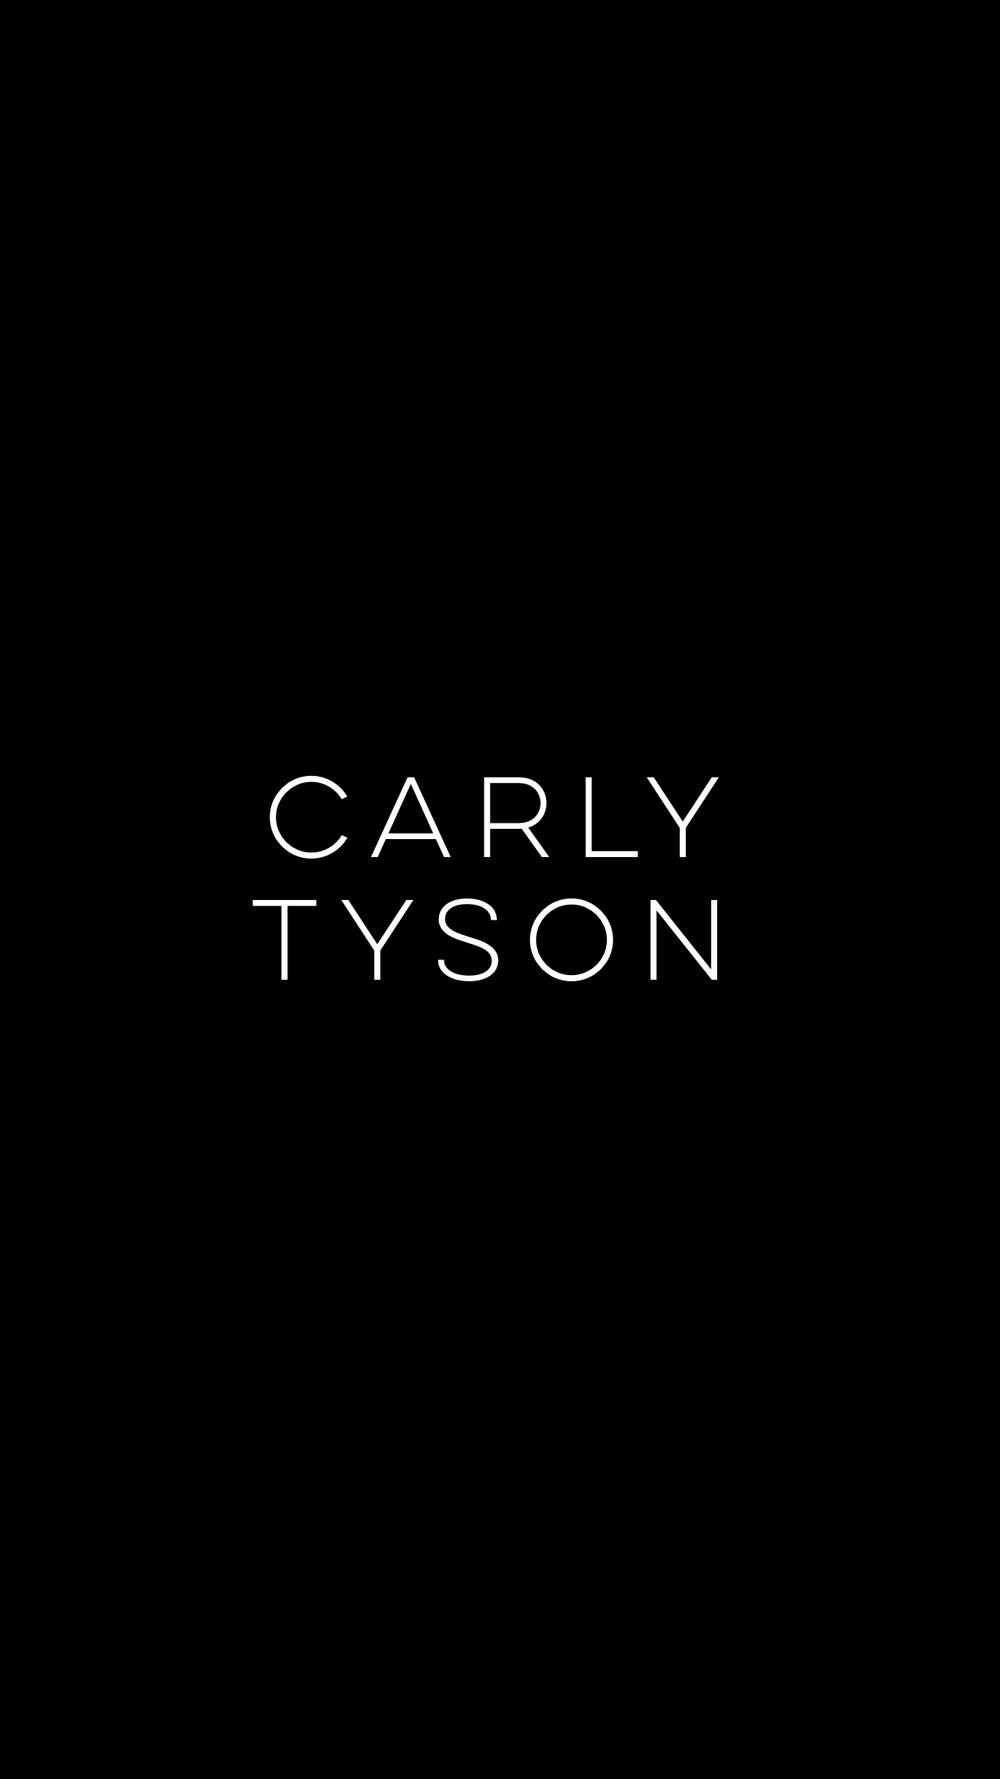 CARLY TYSON (1).jpg